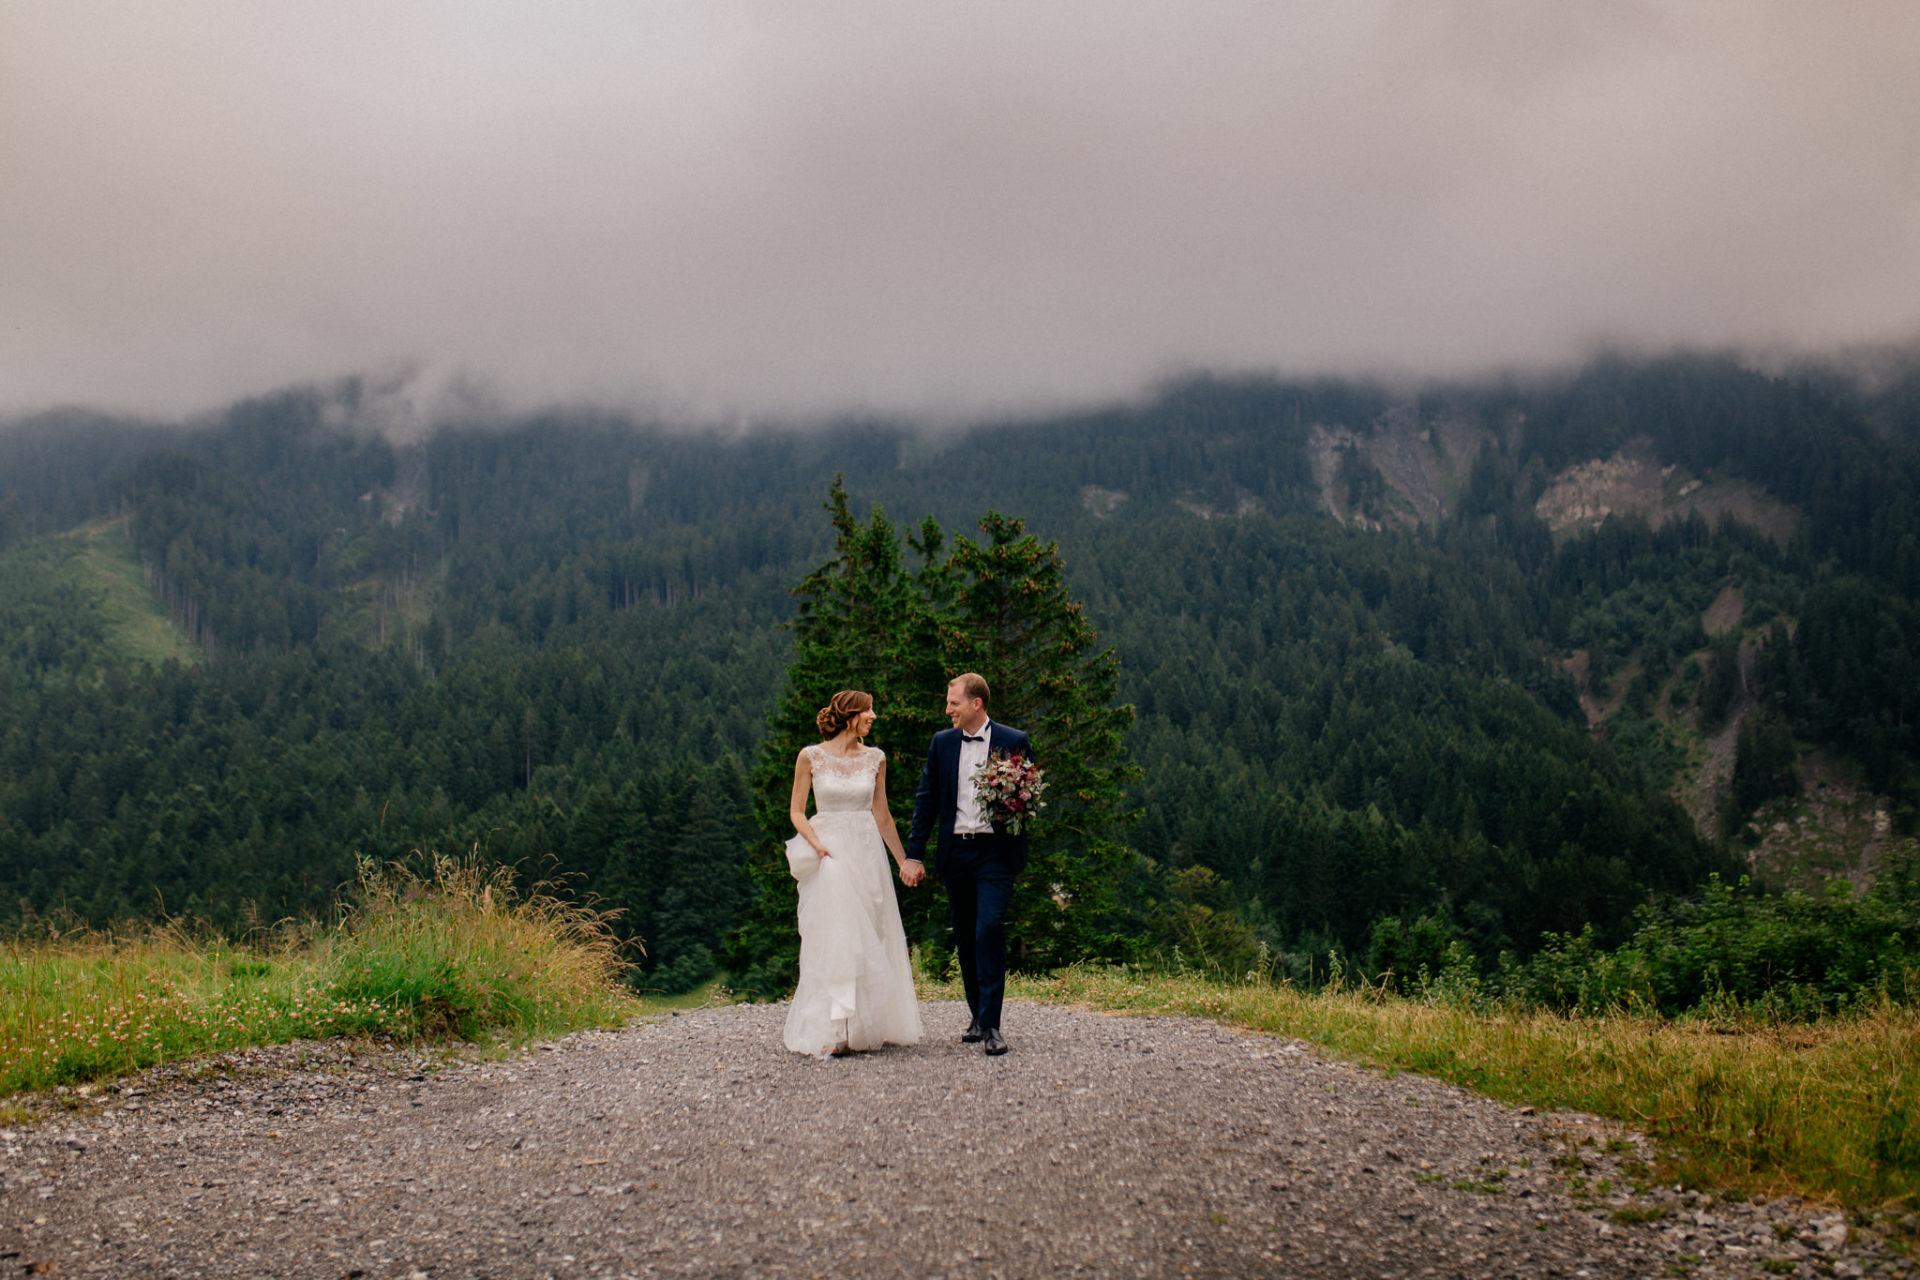 wedding photographer Lech Ahlberg-mountain wedding- bride groom portraits unposed